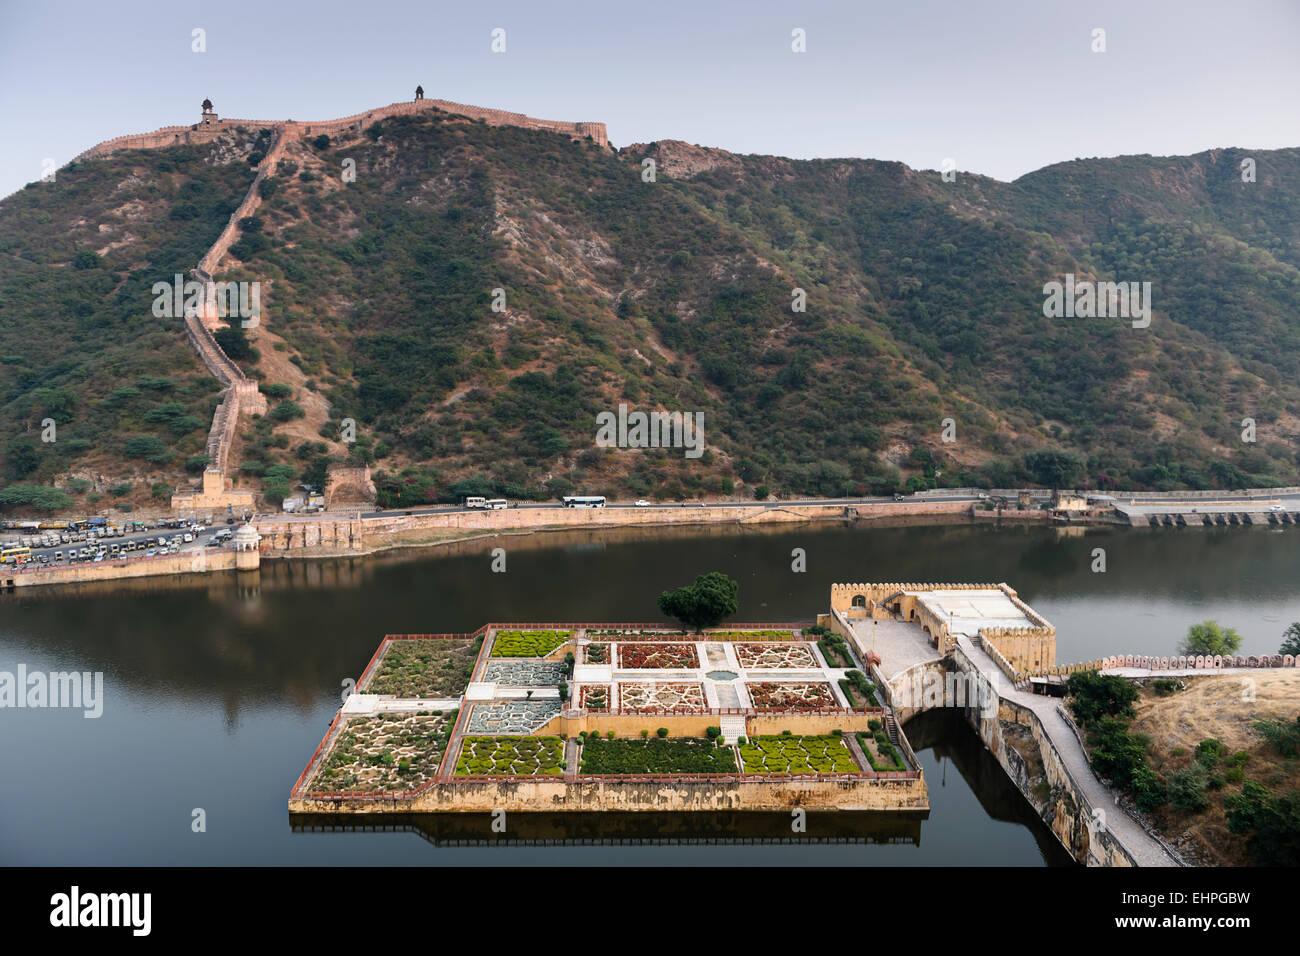 View of Maotha Lake with Kesar Kyari Gardens from Amber Fort & Palace, Jaipur. - Stock Image